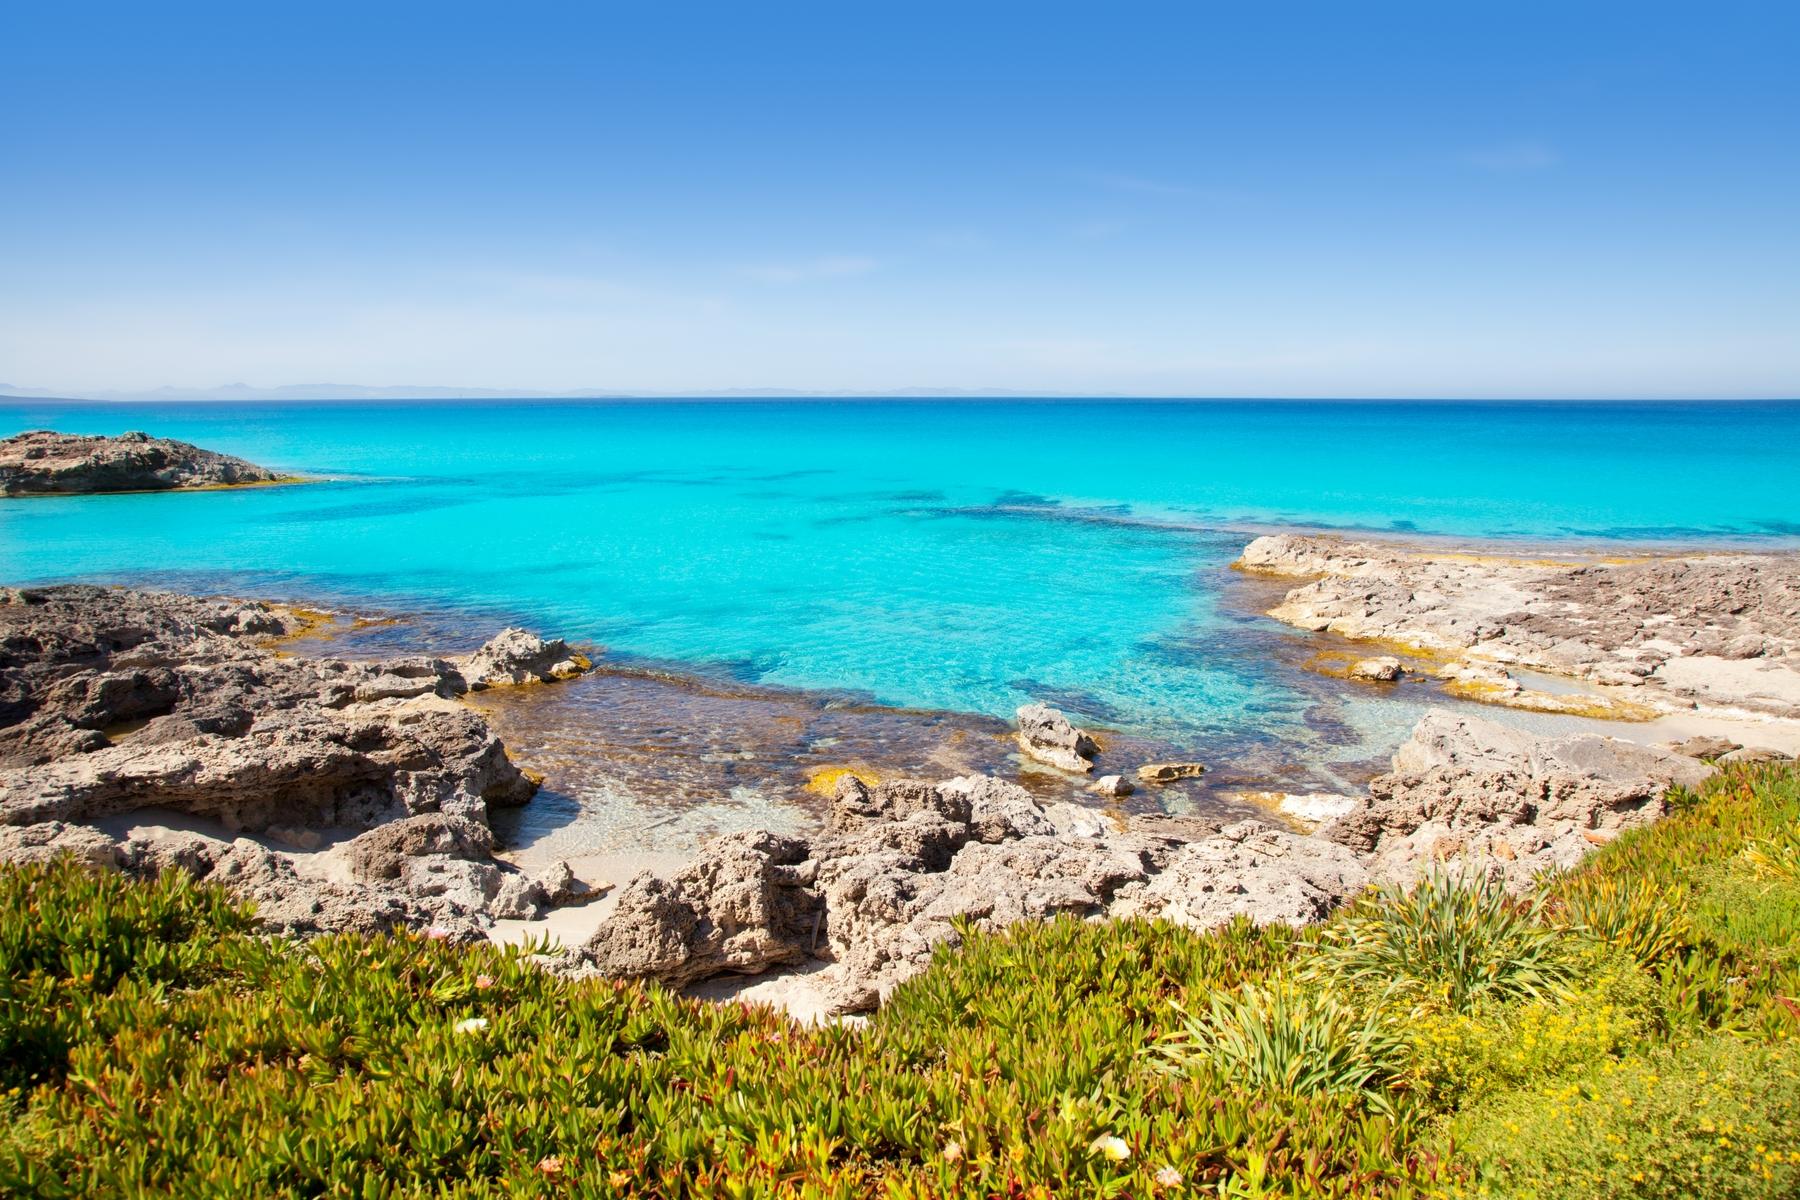 Spiagge Formentera: Sa Roqueta e Ses Canyes